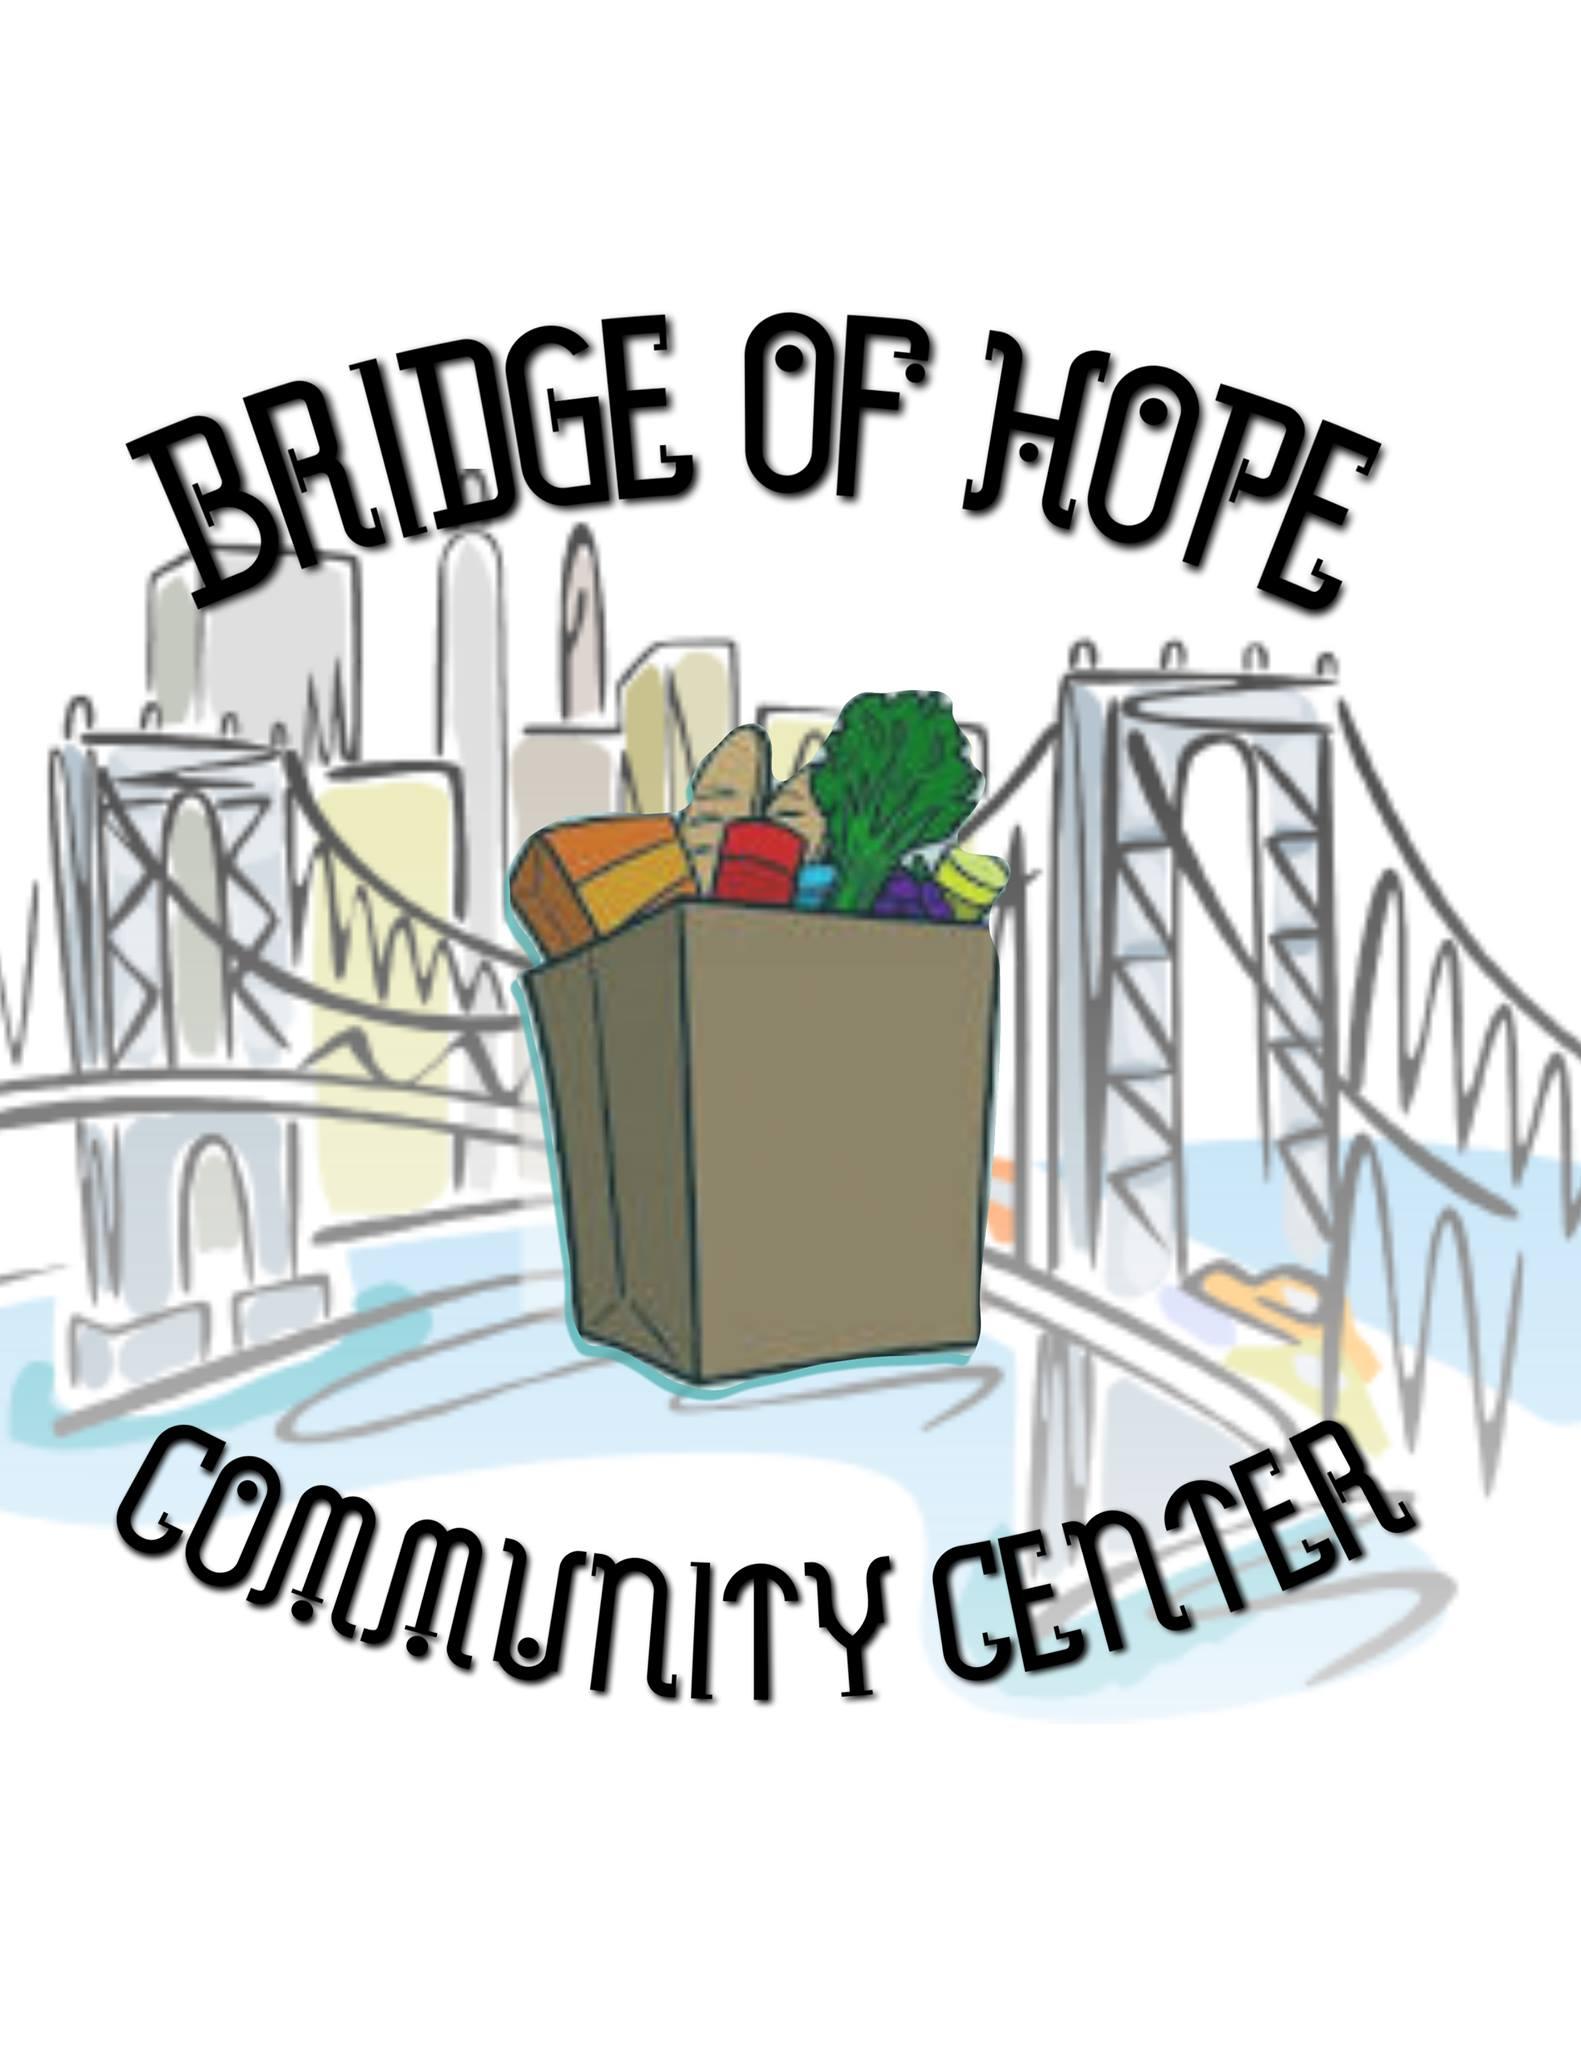 Food Distribution Center - Bridge of Hope Center